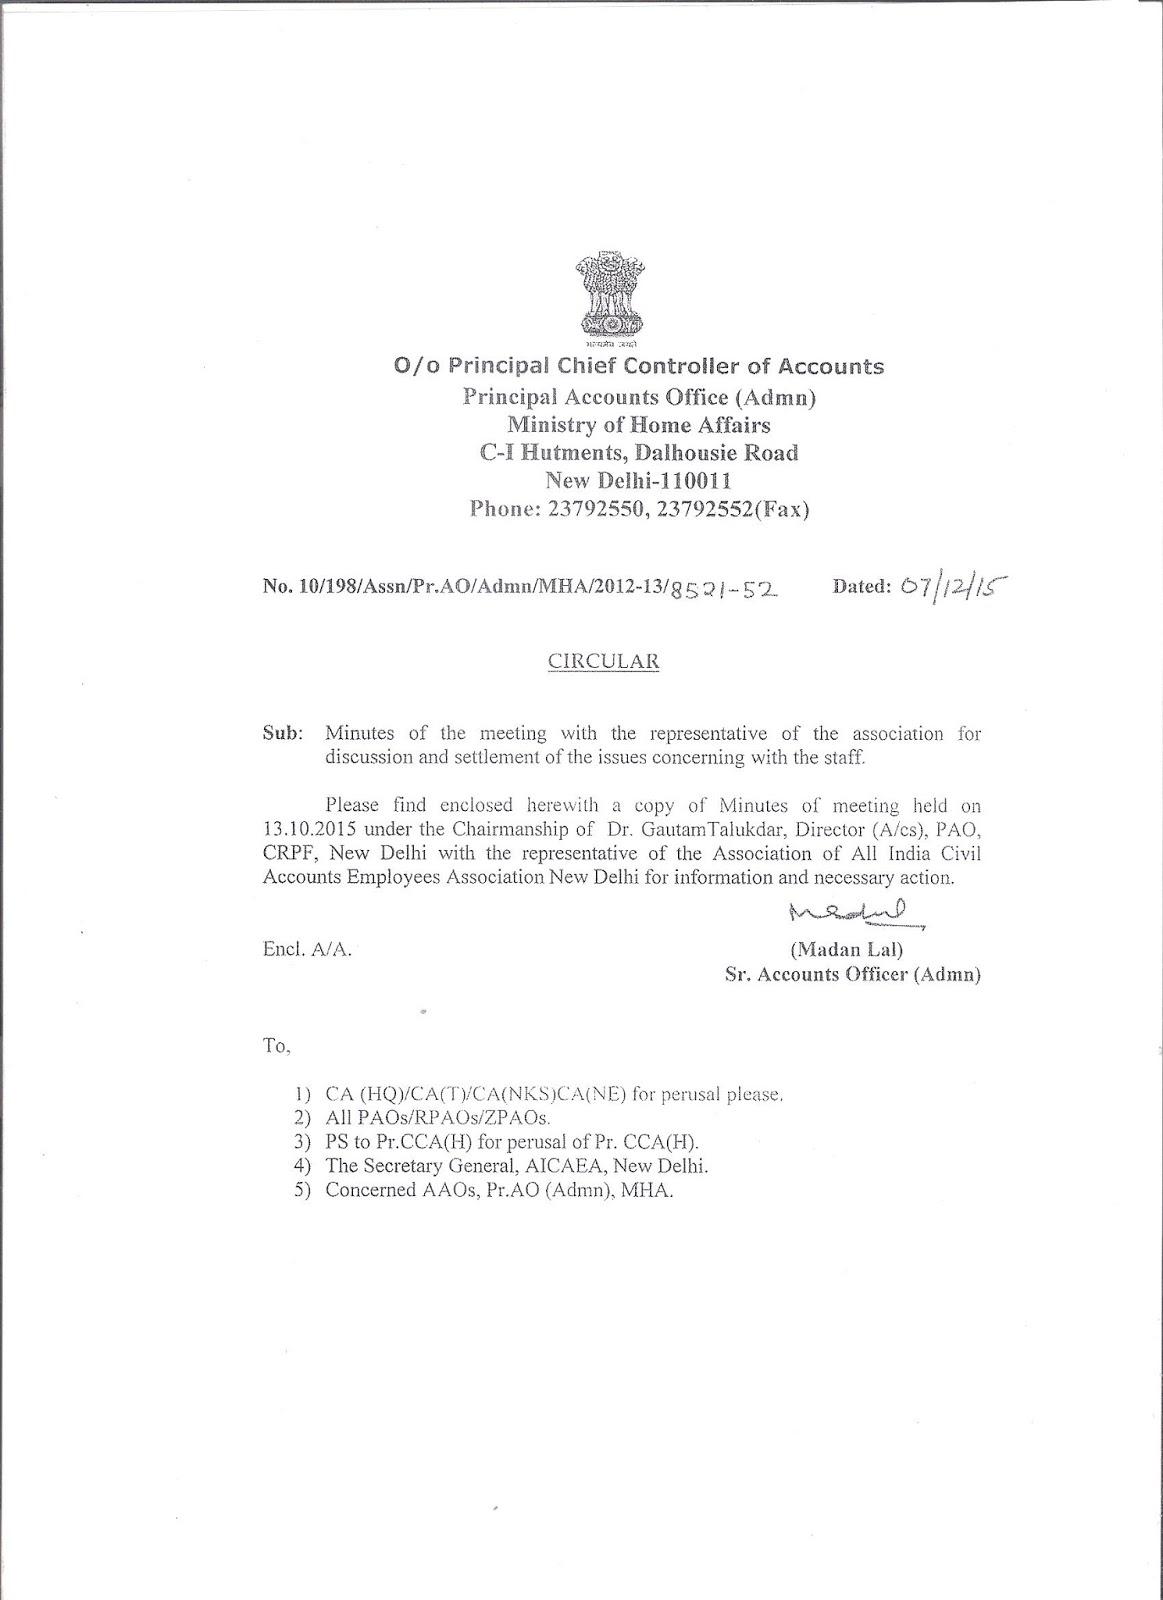 National Federation of Civil Accounts Associations (NFCAA)